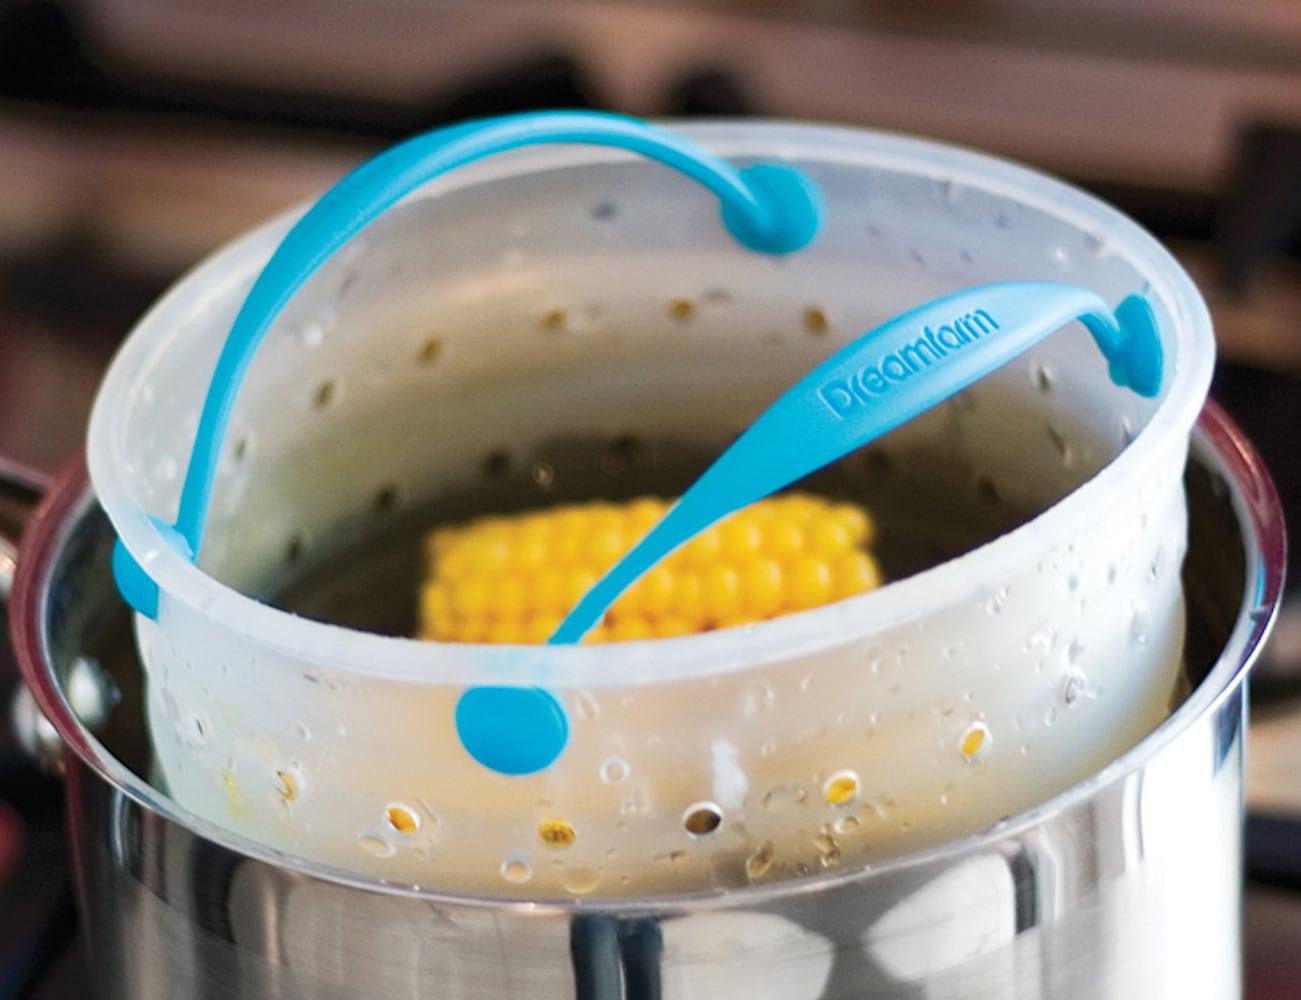 Dreamfarm Vebo Vegetable Steamer Basket fits any pot